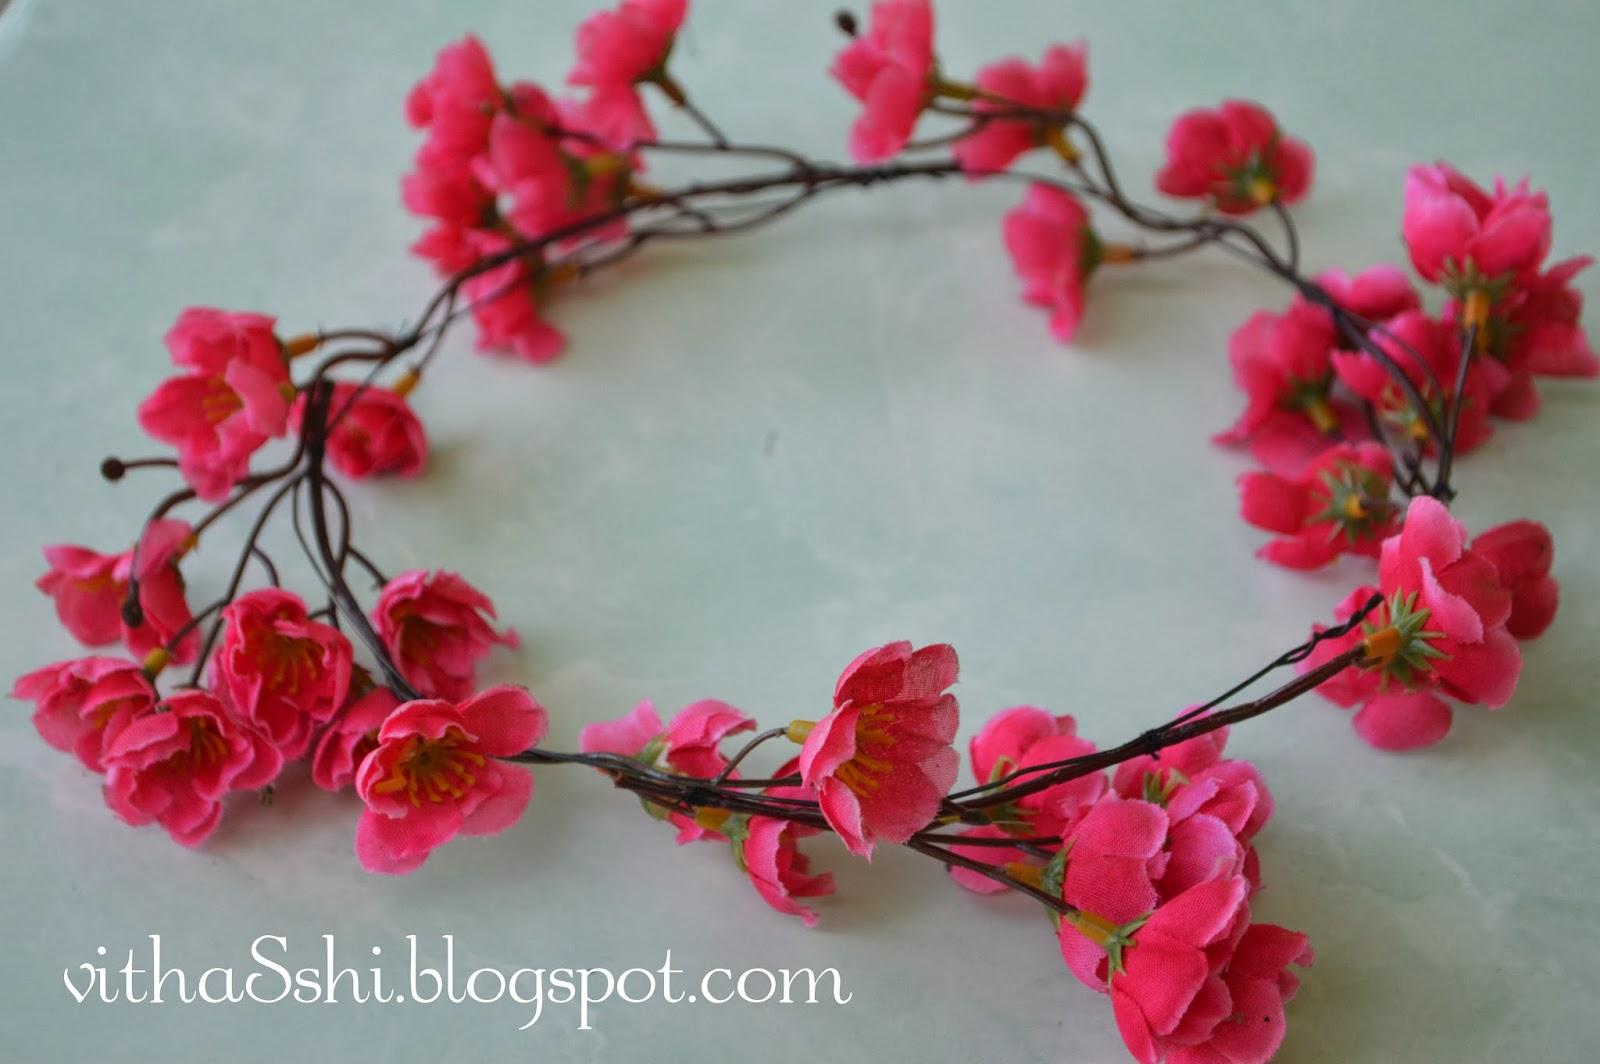 Cara buat mahkota bunga yang simple bradva docefo cara membuat mahkota bunga flower crown princess izmirmasajfo